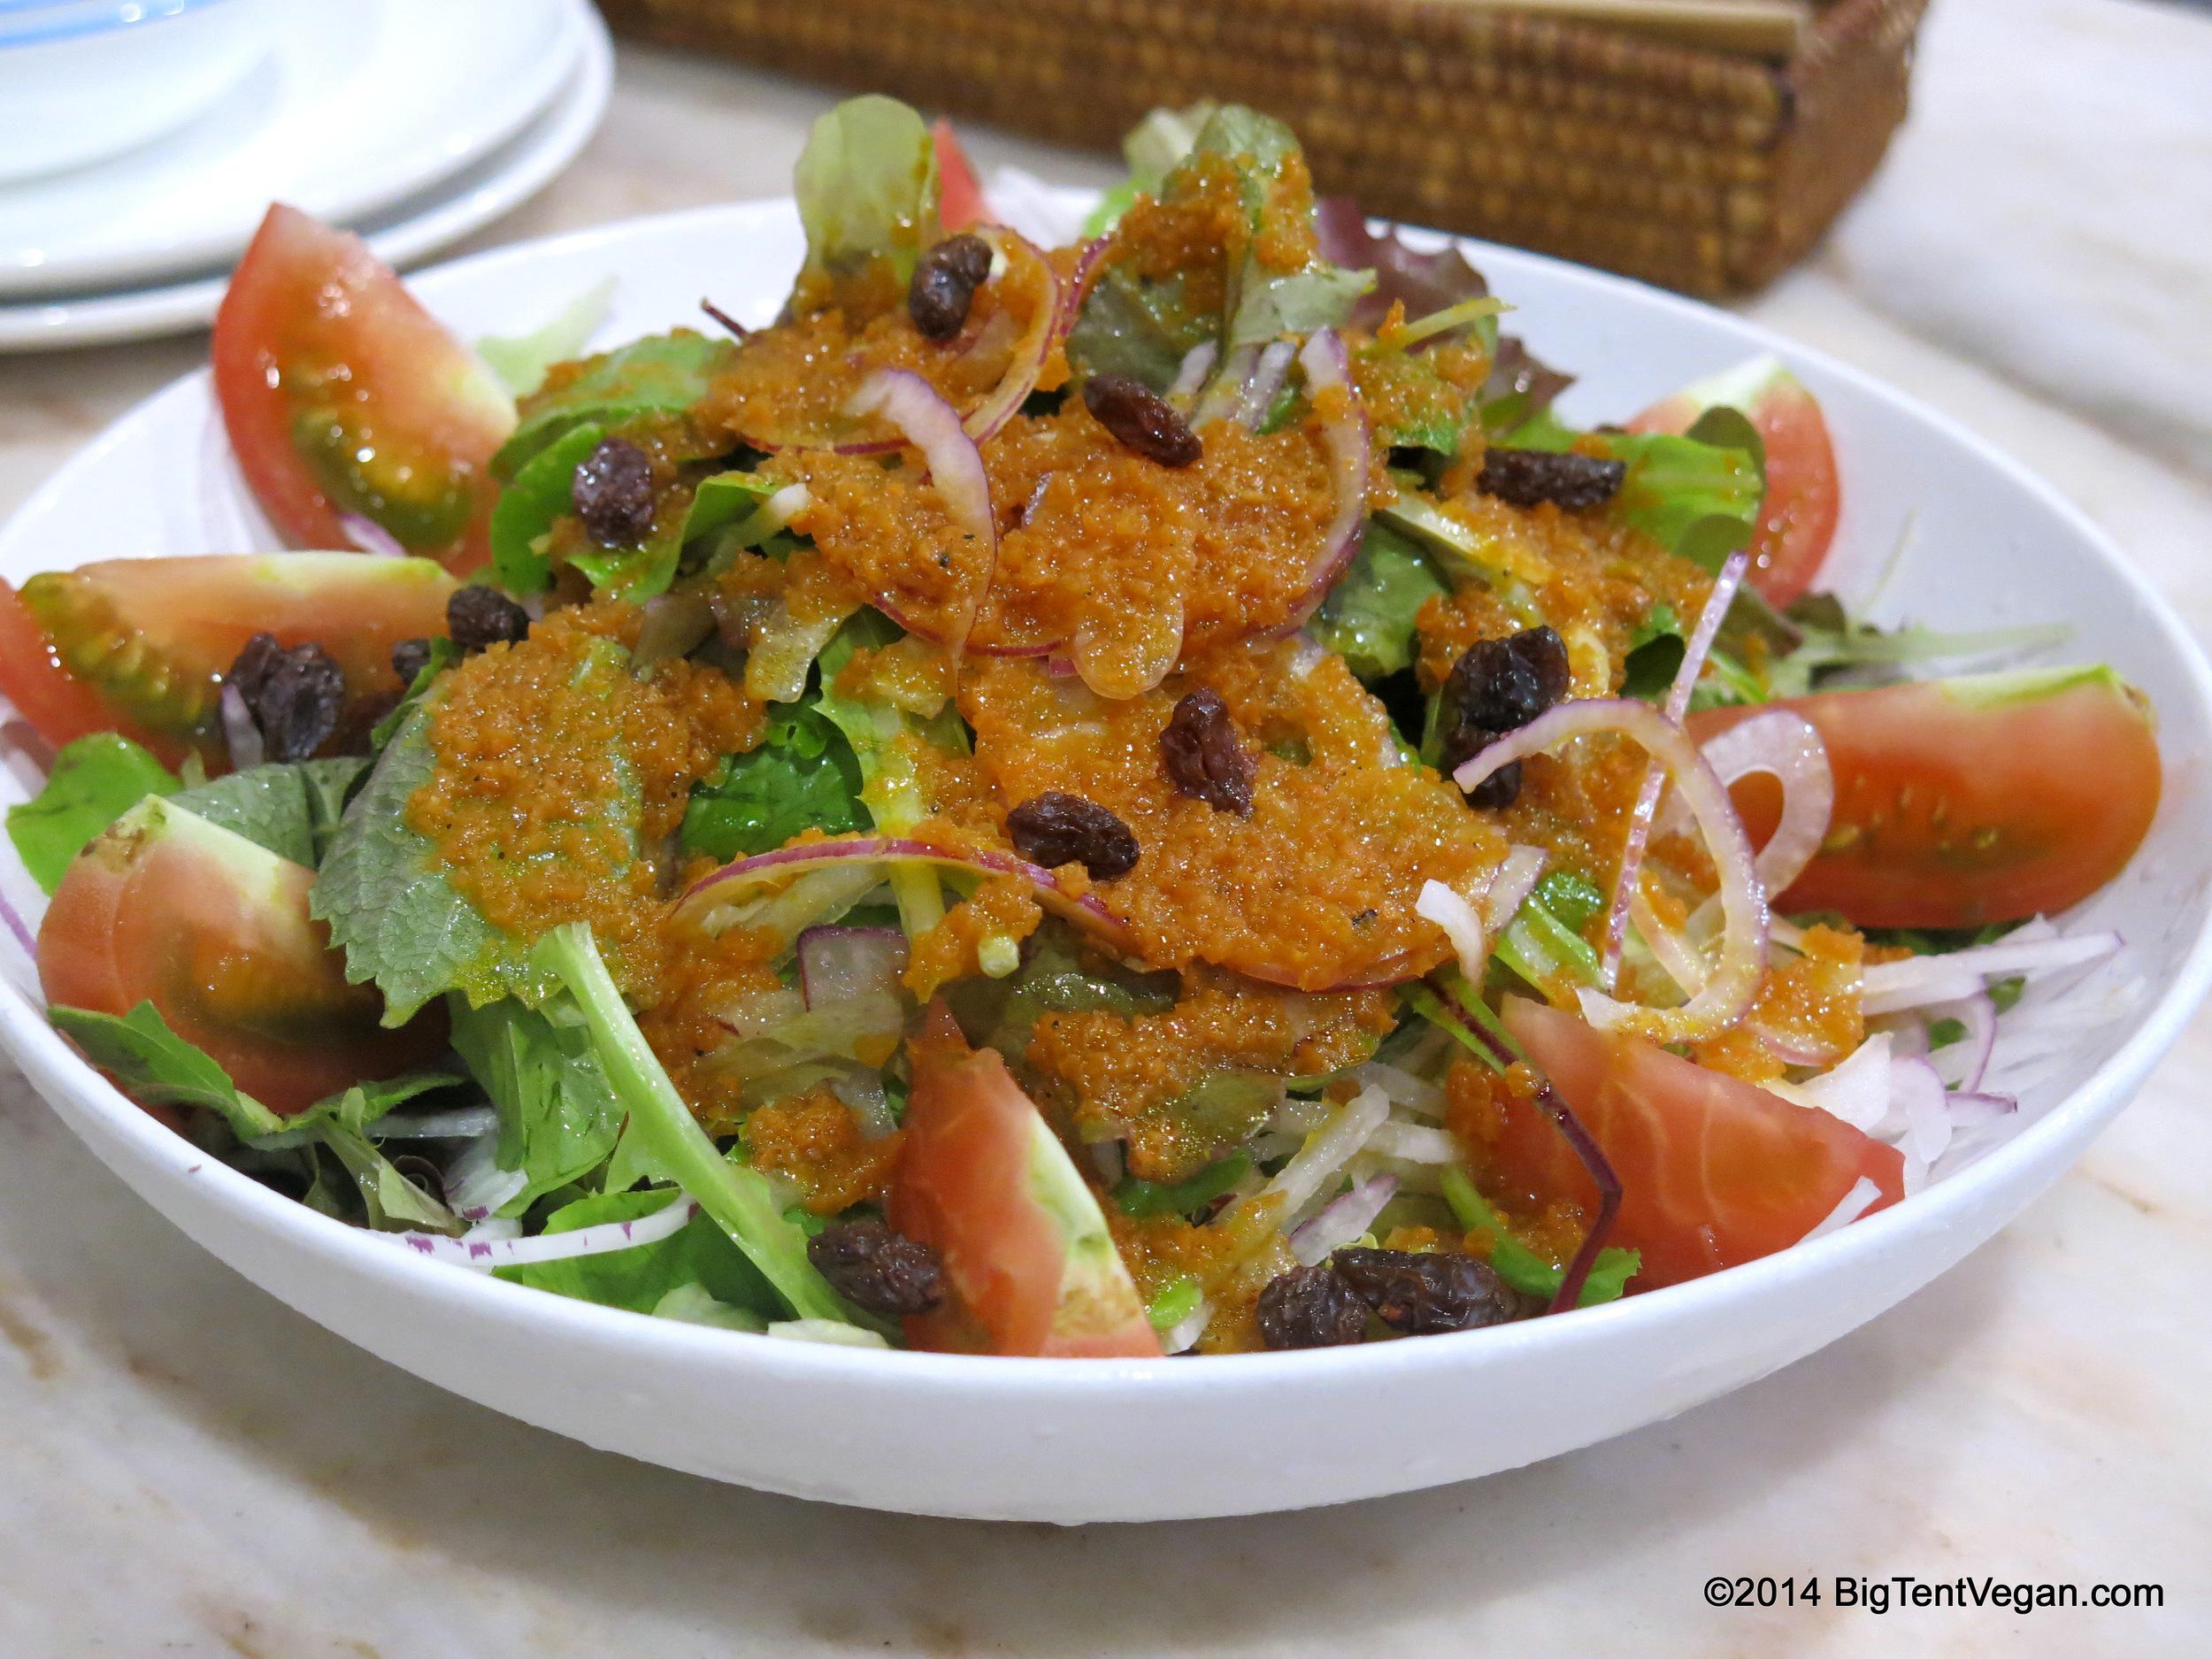 "Garden Salad from 100% Vegans Caf       12.00       é       Normal   0           false   false   false     EN-US   X-NONE   X-NONE                                        MicrosoftInternetExplorer4                                                                                                                                                                                                                                                                                                                                            /* Style Definitions */  table.MsoNormalTable {mso-style-name:""Table Normal""; mso-tstyle-rowband-size:0; mso-tstyle-colband-size:0; mso-style-noshow:yes; mso-style-priority:99; mso-style-qformat:yes; mso-style-parent:""""; mso-padding-alt:0in 5.4pt 0in 5.4pt; mso-para-margin-top:0in; mso-para-margin-right:0in; mso-para-margin-bottom:10.0pt; mso-para-margin-left:0in; line-height:115%; mso-pagination:widow-orphan; font-size:11.0pt; font-family:""Calibri"",""sans-serif""; mso-ascii-font-family:Calibri; mso-ascii-theme-font:minor-latin; mso-fareast-font-family:""Times New Roman""; mso-fareast-theme-font:minor-fareast; mso-hansi-font-family:Calibri; mso-hansi-theme-font:minor-latin;}     and Restaurant in Kyoto, Japan"